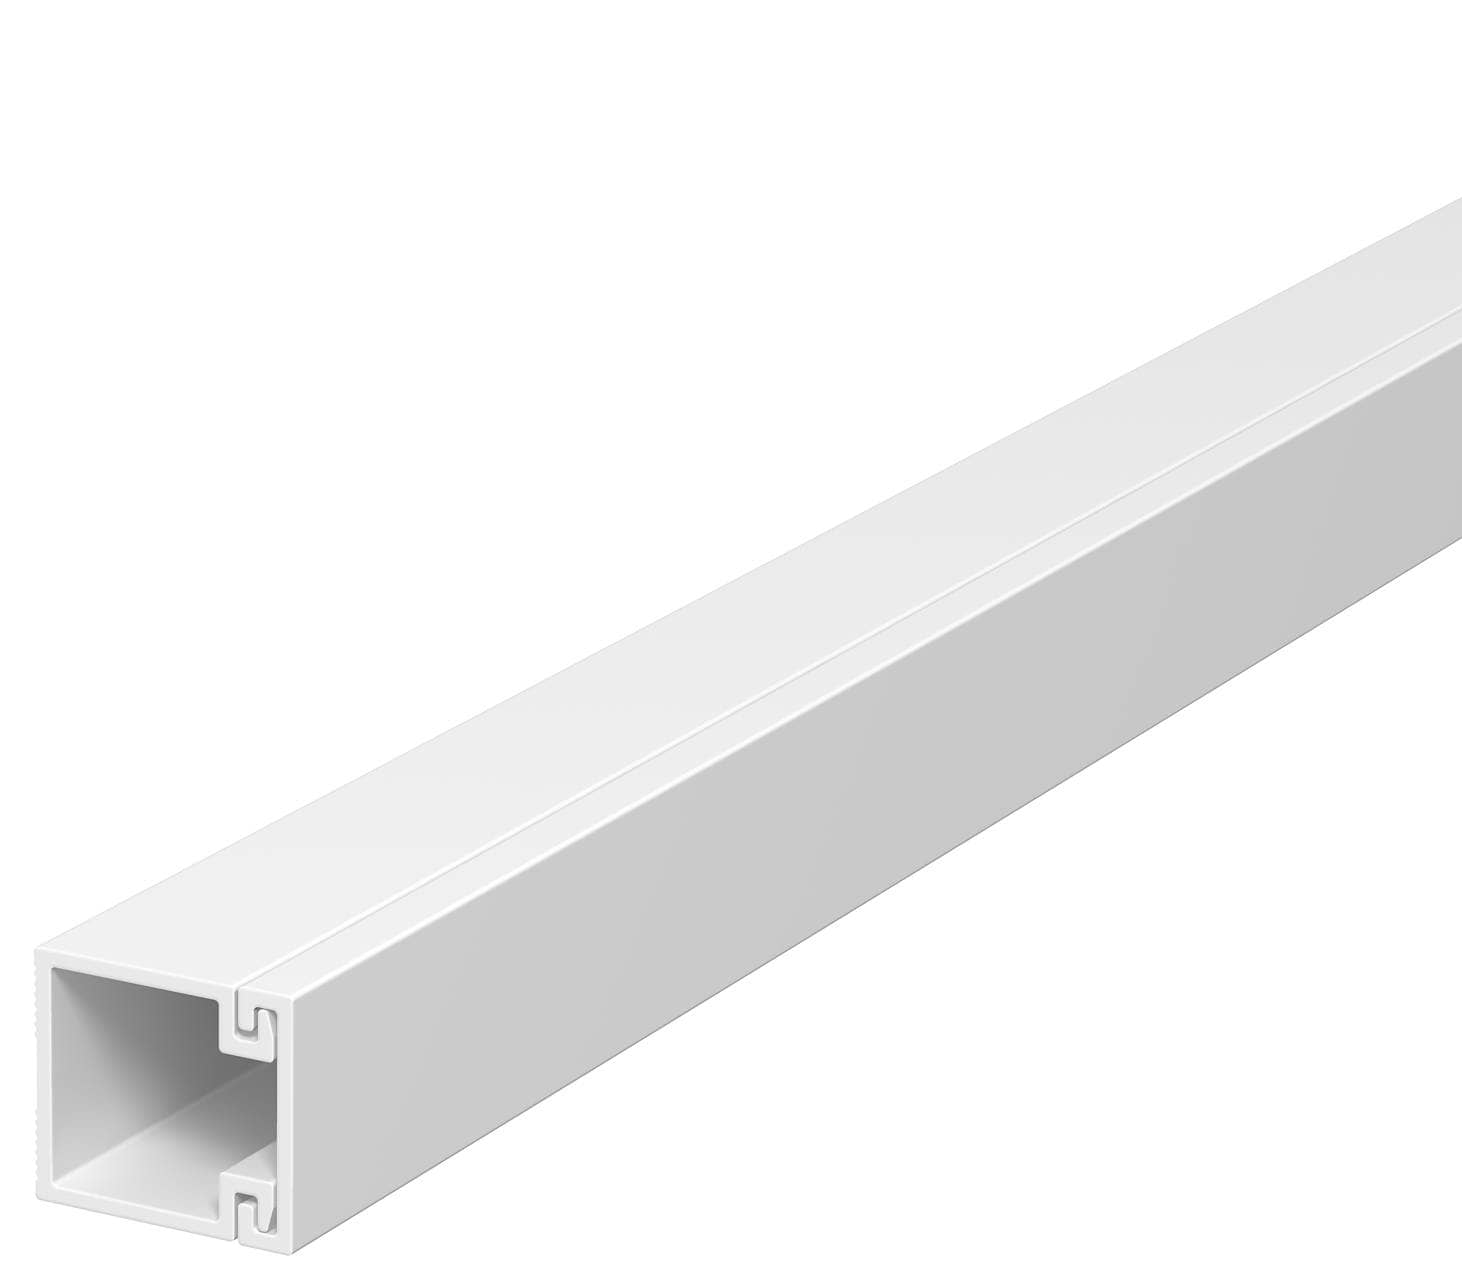 OBO Bettermann 15x15 WDK15015RW Wand+Deckenkanal mit Bodenlochung 15x15mm 2 Meter PVC reinweiss